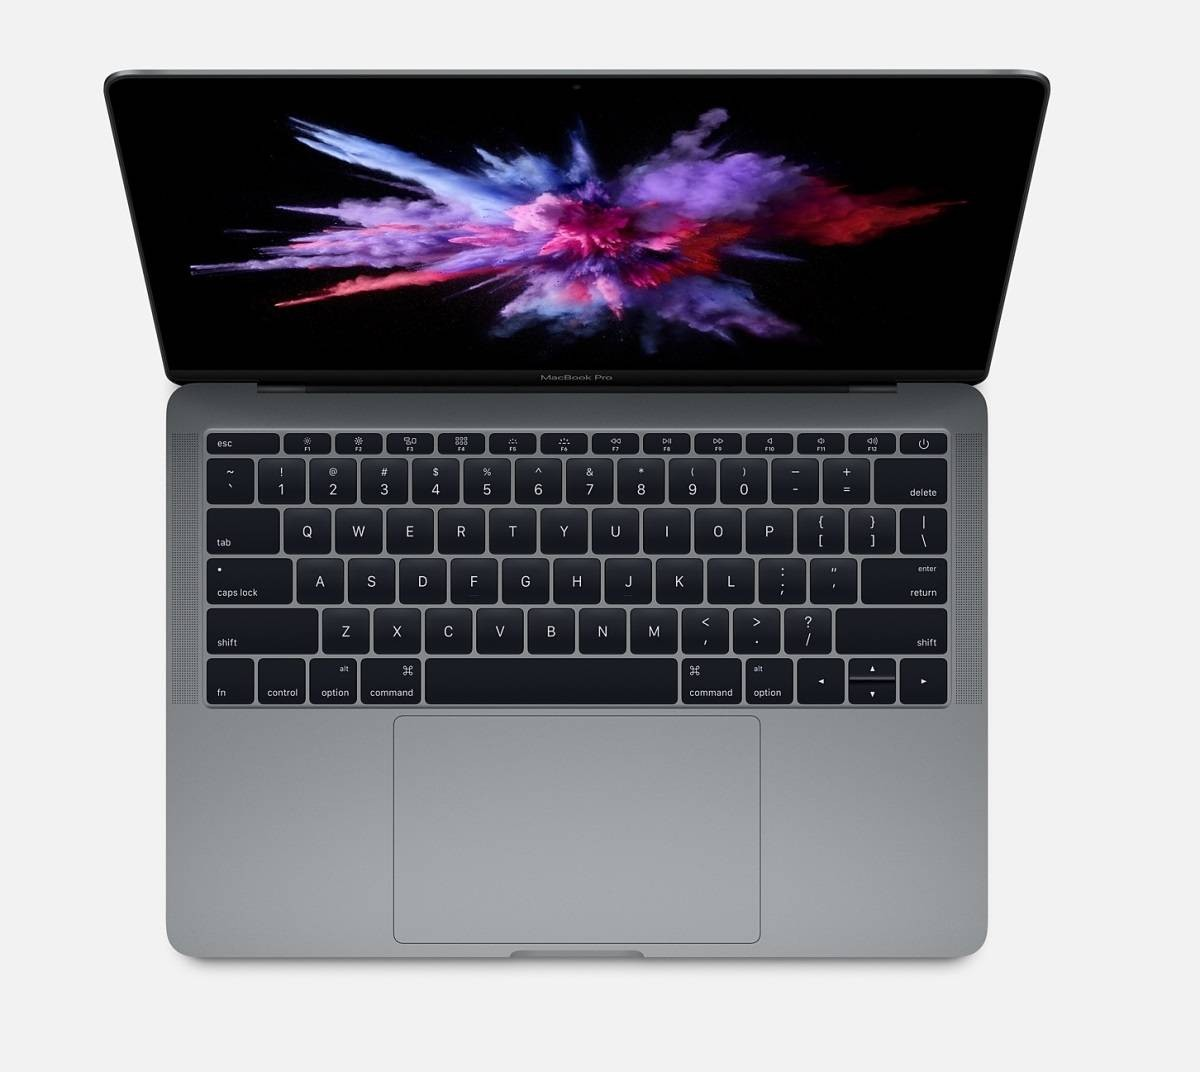 "MacBook Pro 13"" (2017) Rétina Core I5 2,3 Ghz, 8 Go Ram, 256 GO SSD Gris Sidéral"